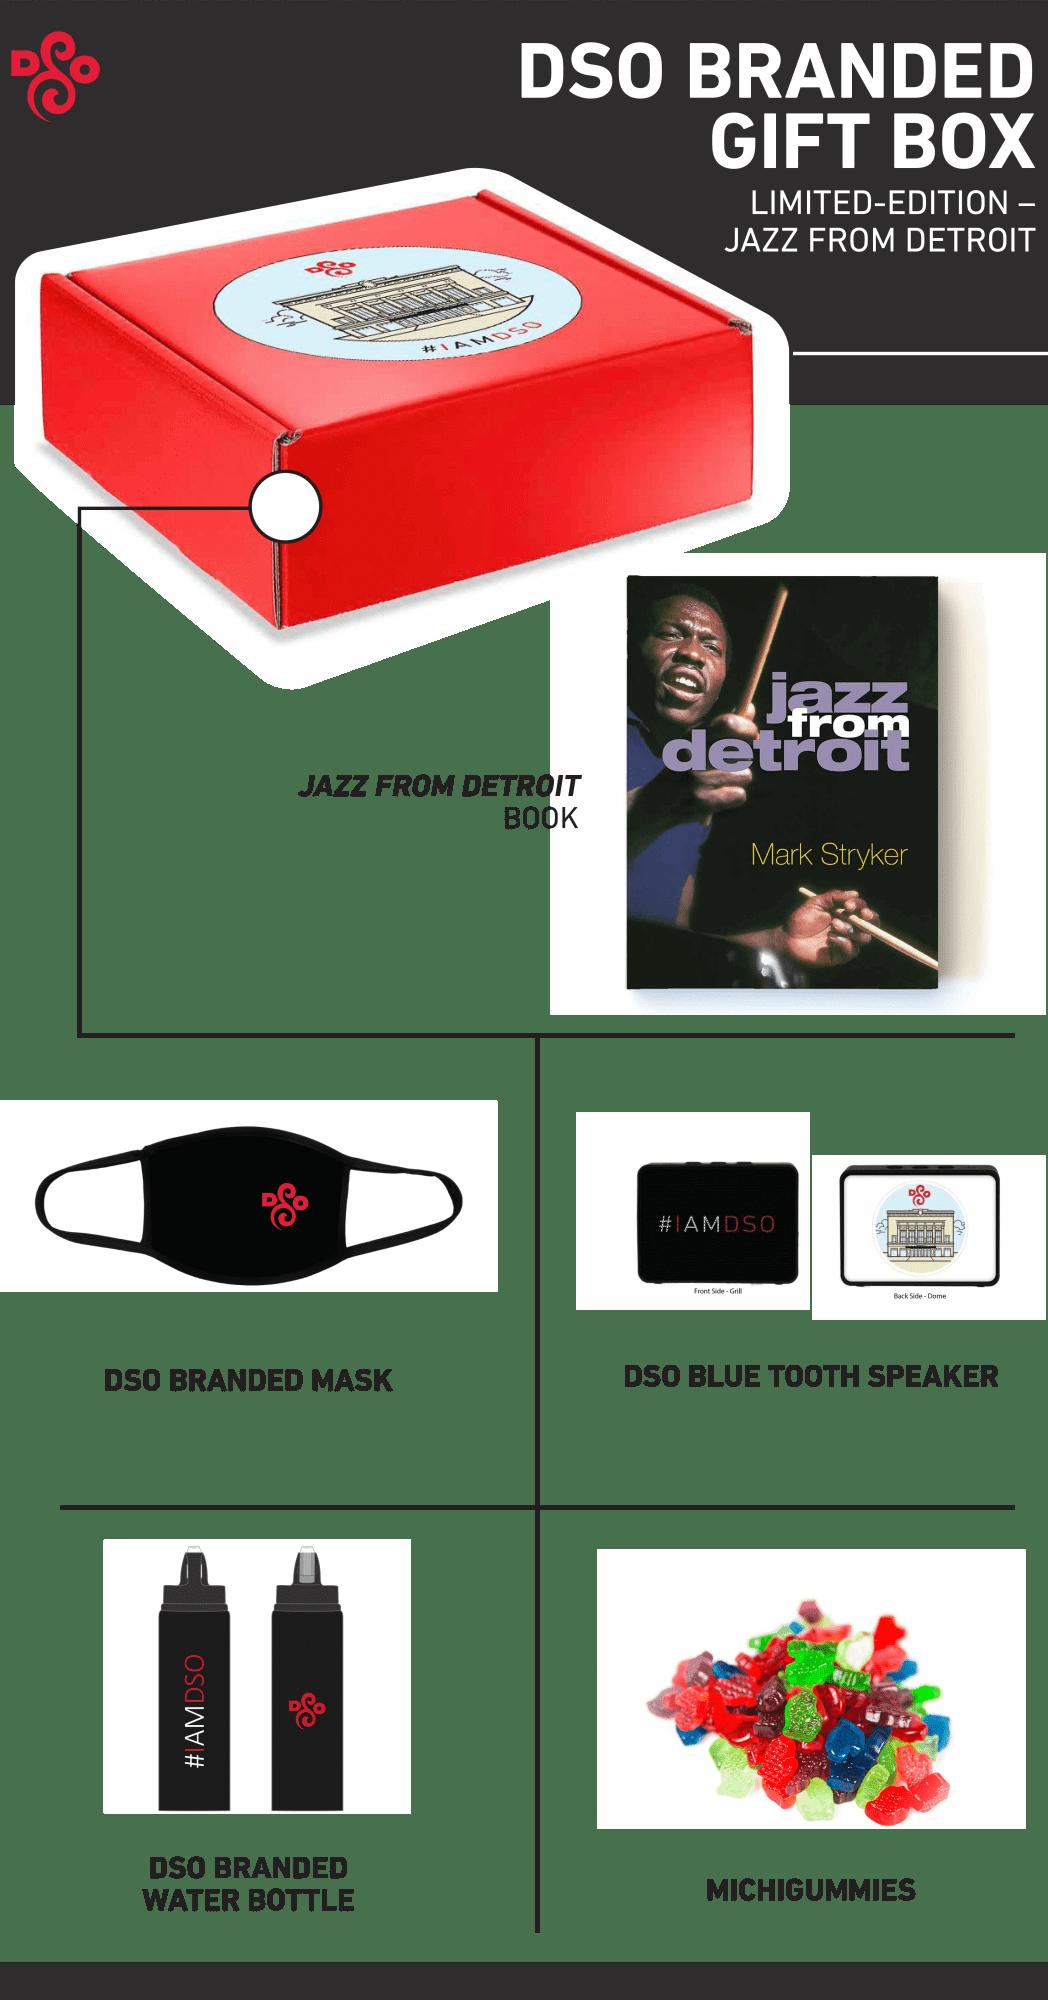 giftbox graphic 4 jazz